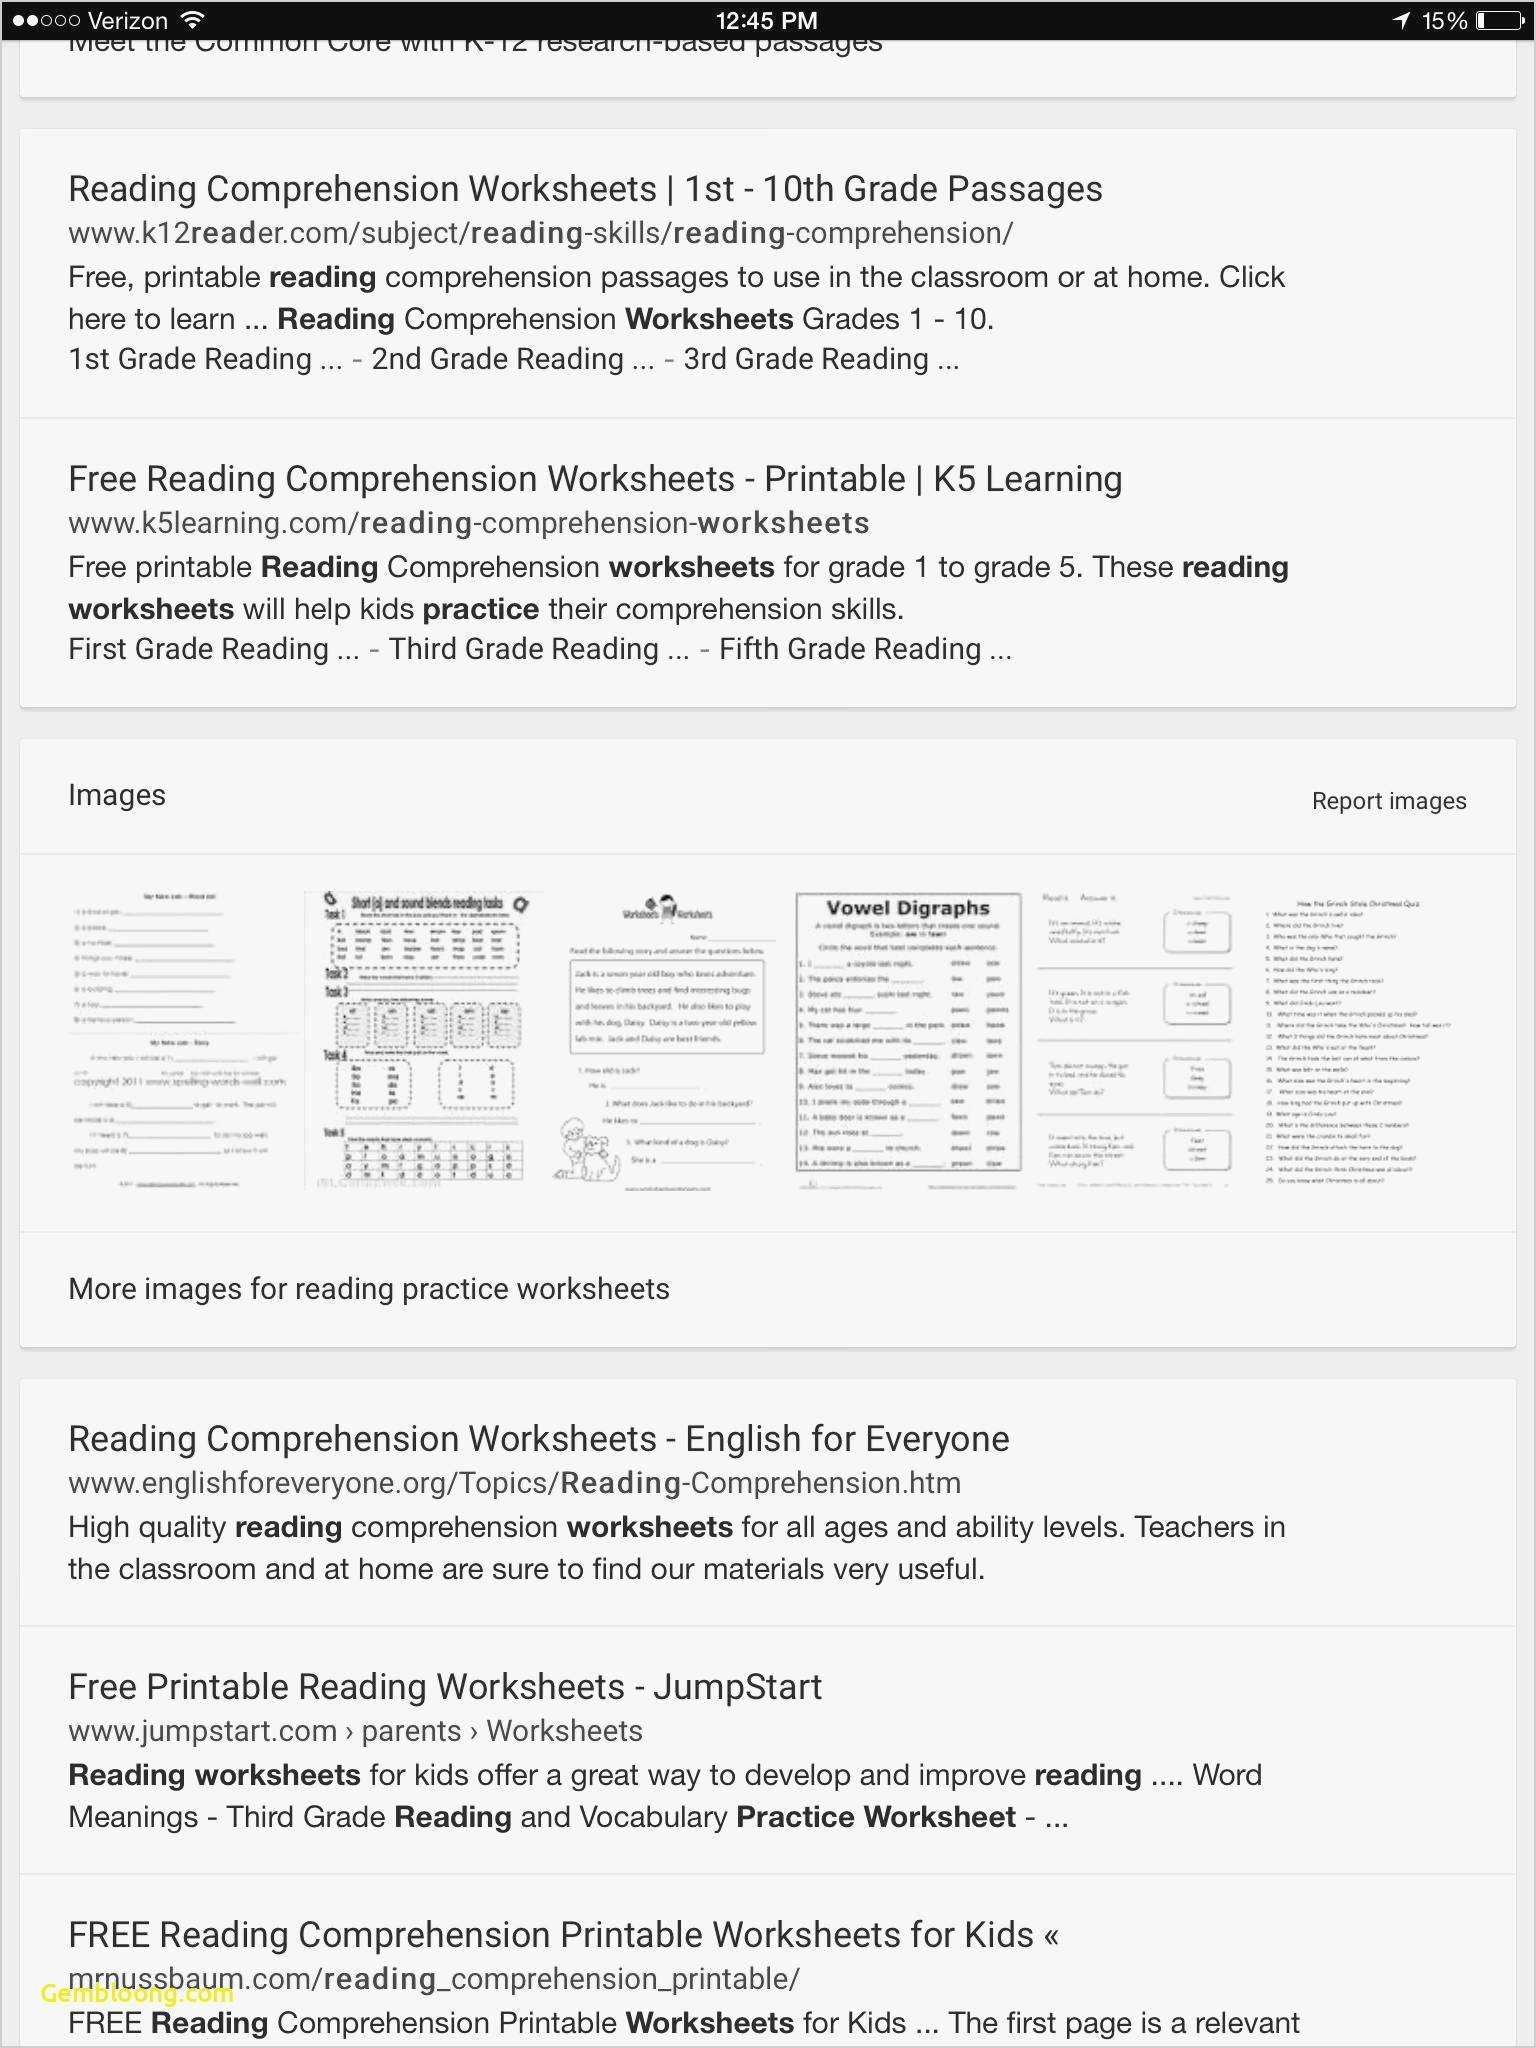 Reading Worksheeets